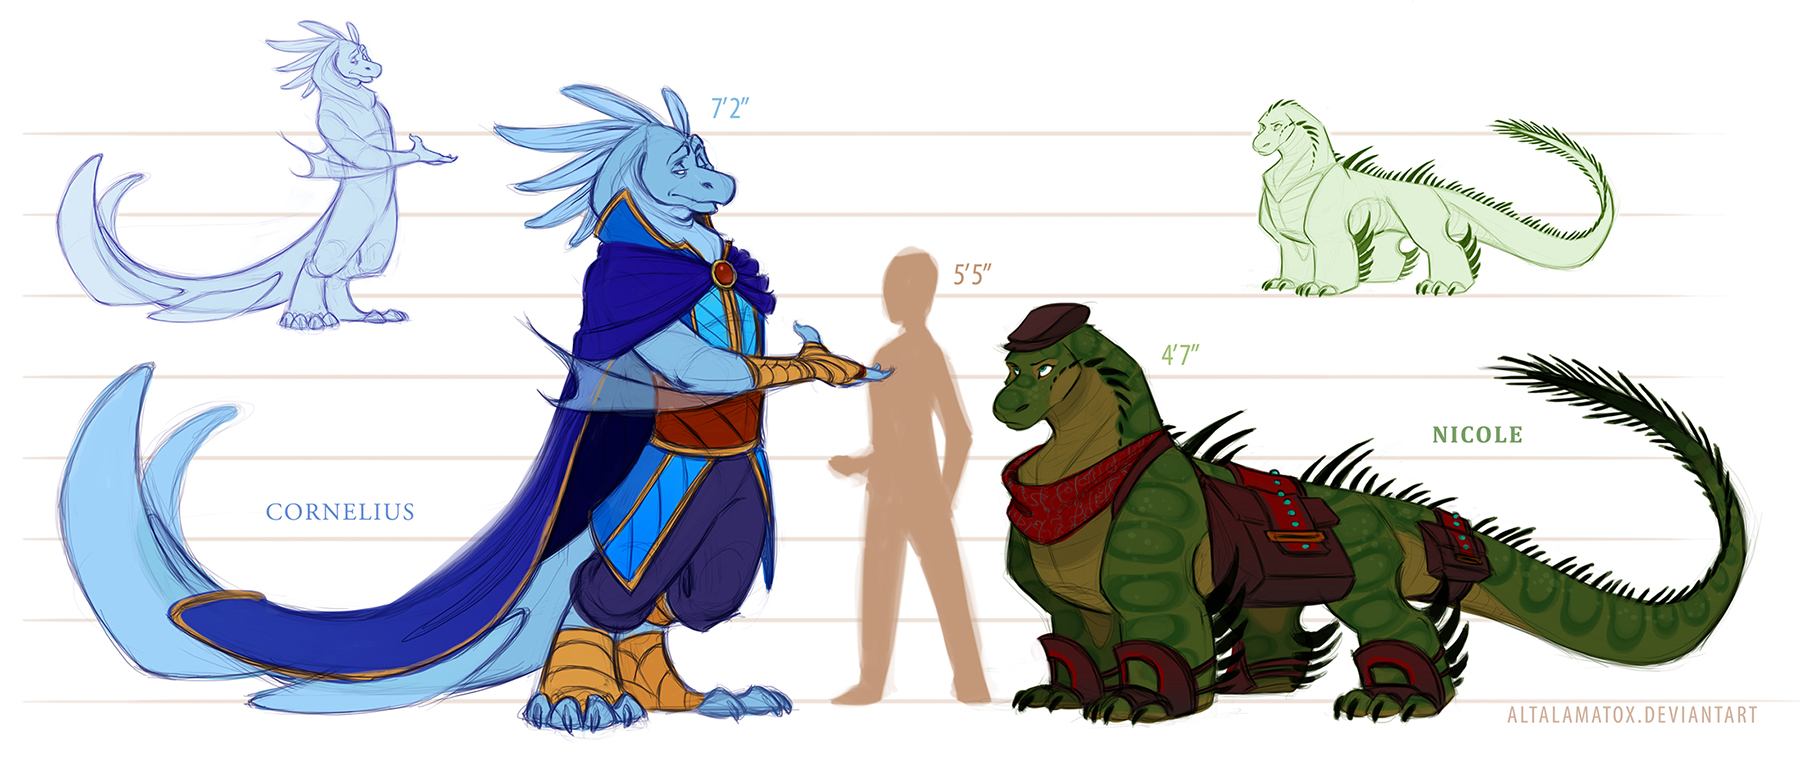 Character Design: Cornelius vs. Nicole by Altalamatox